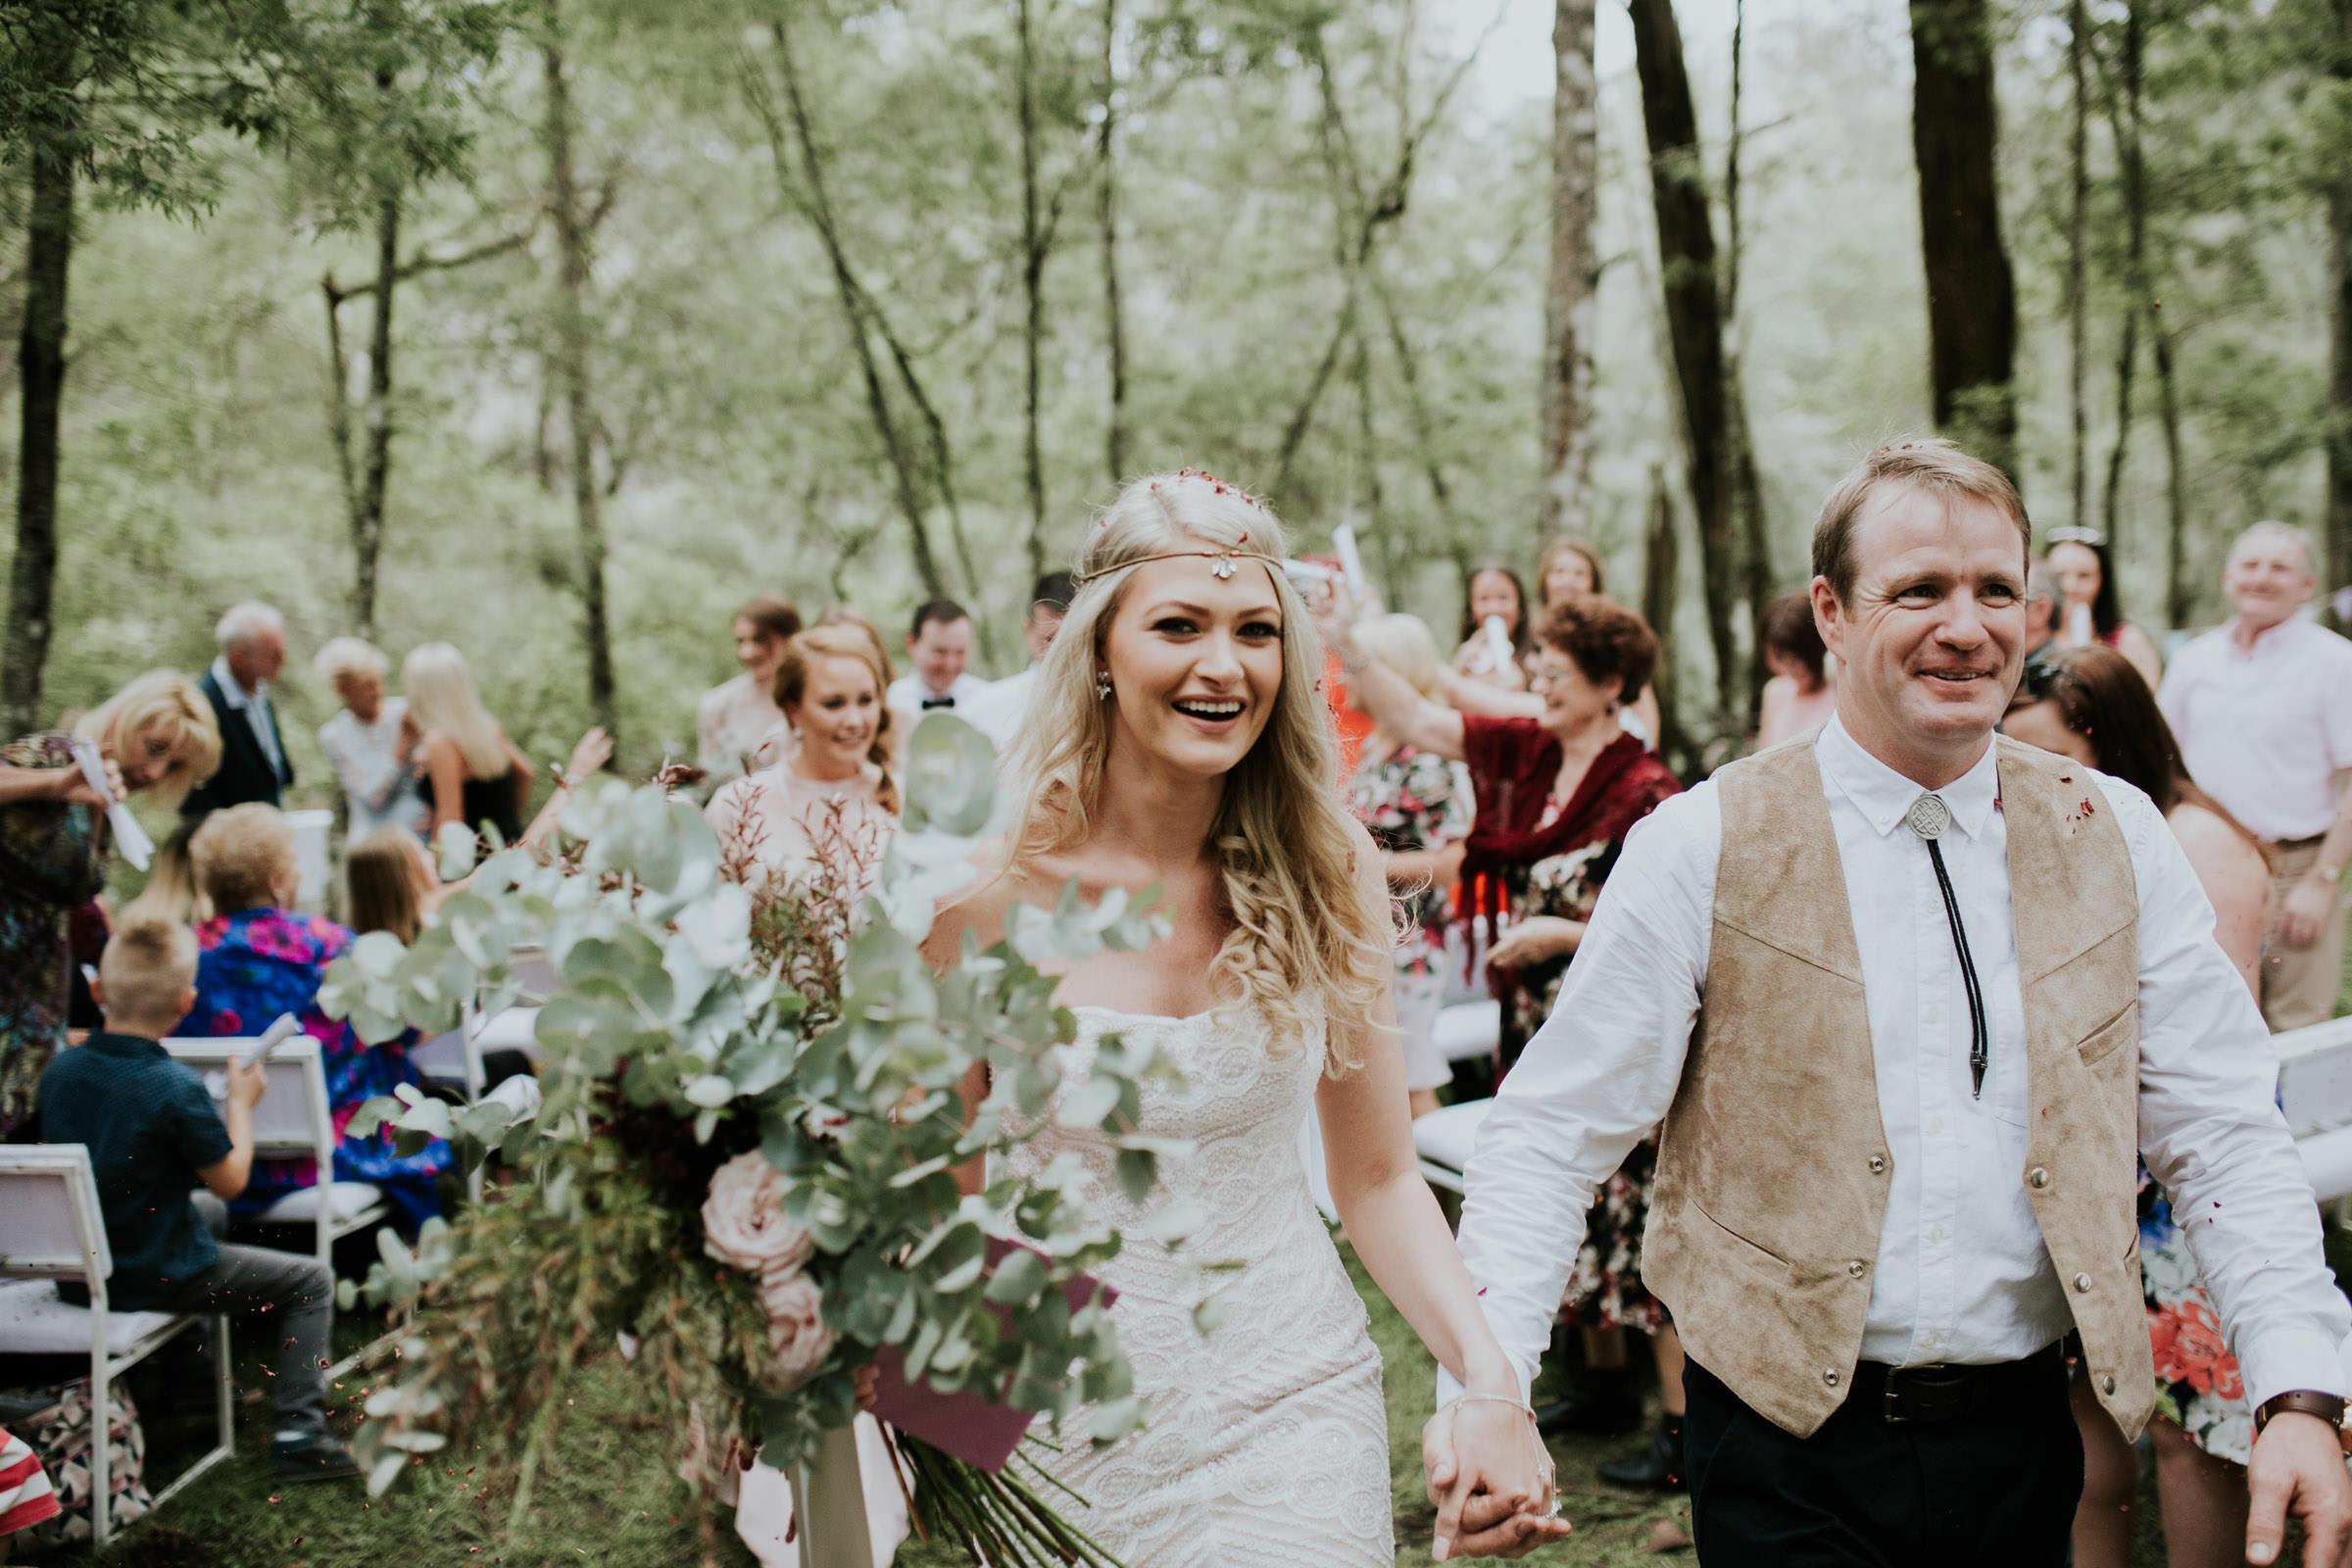 Emma+John+Far+South+Coast+Wedding+Festivl+Glamping+Bush-116.jpg